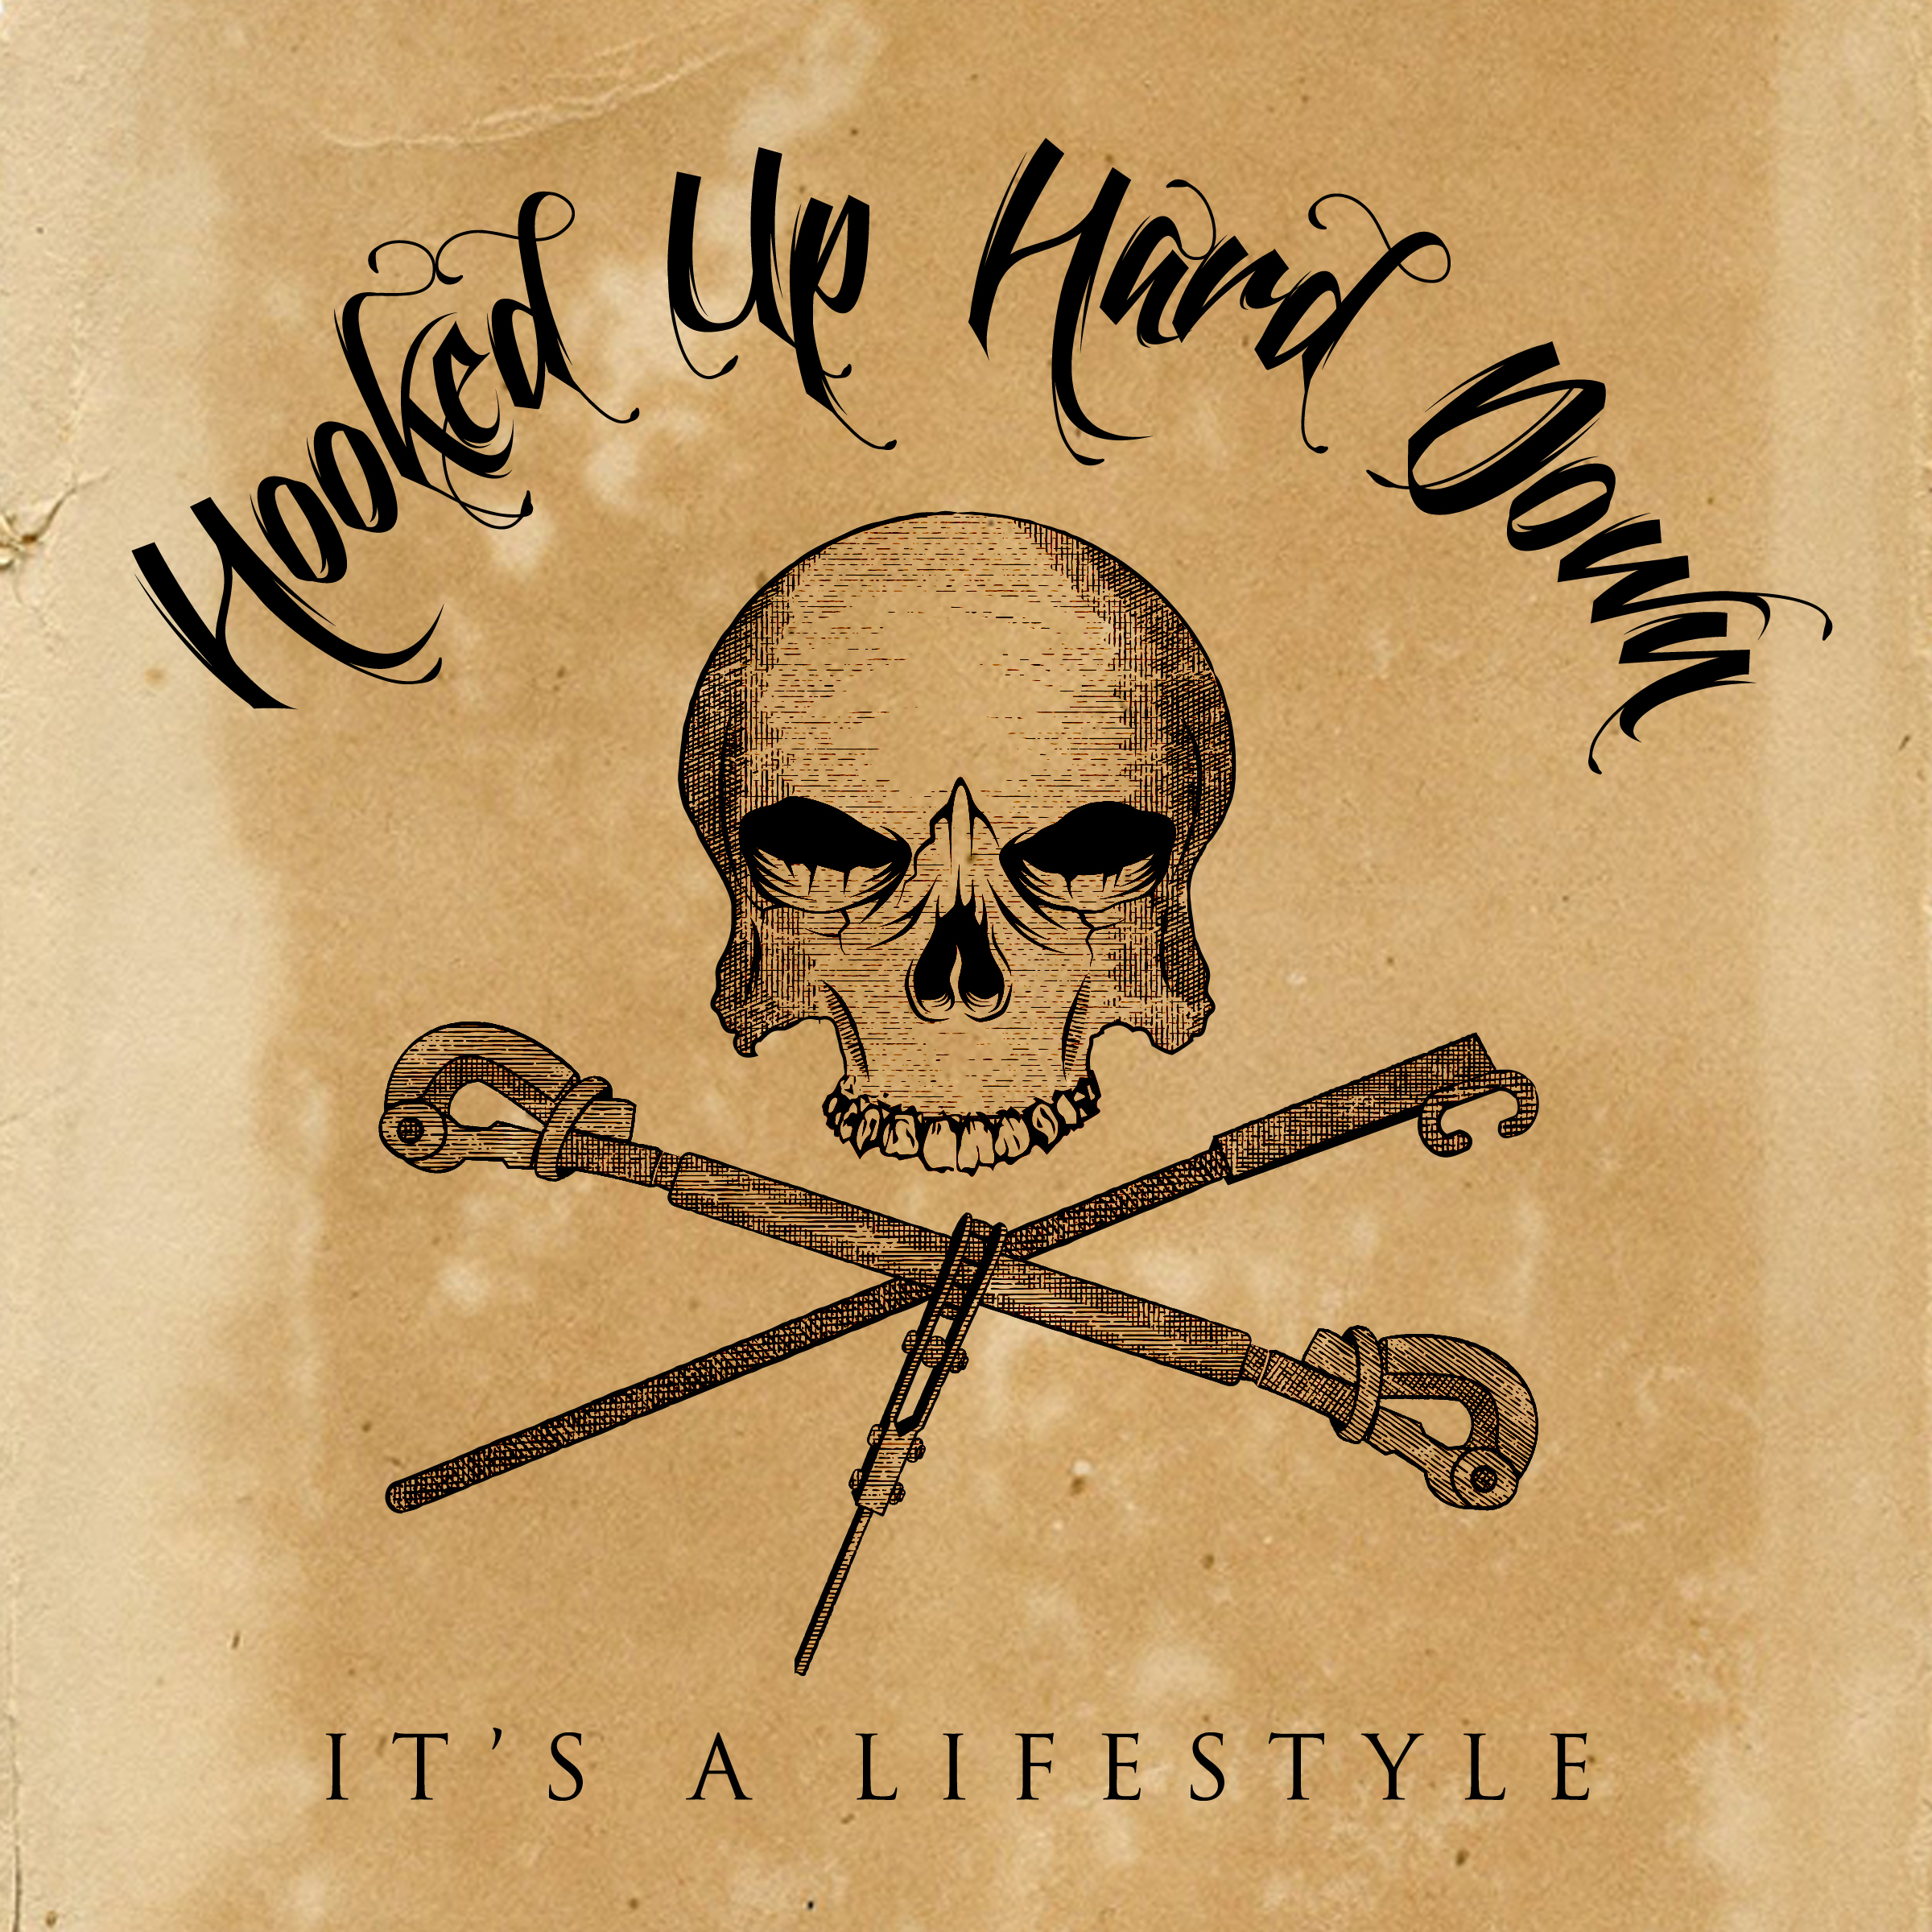 Logo Design Hooked Up Hard Down (Towboating Community)